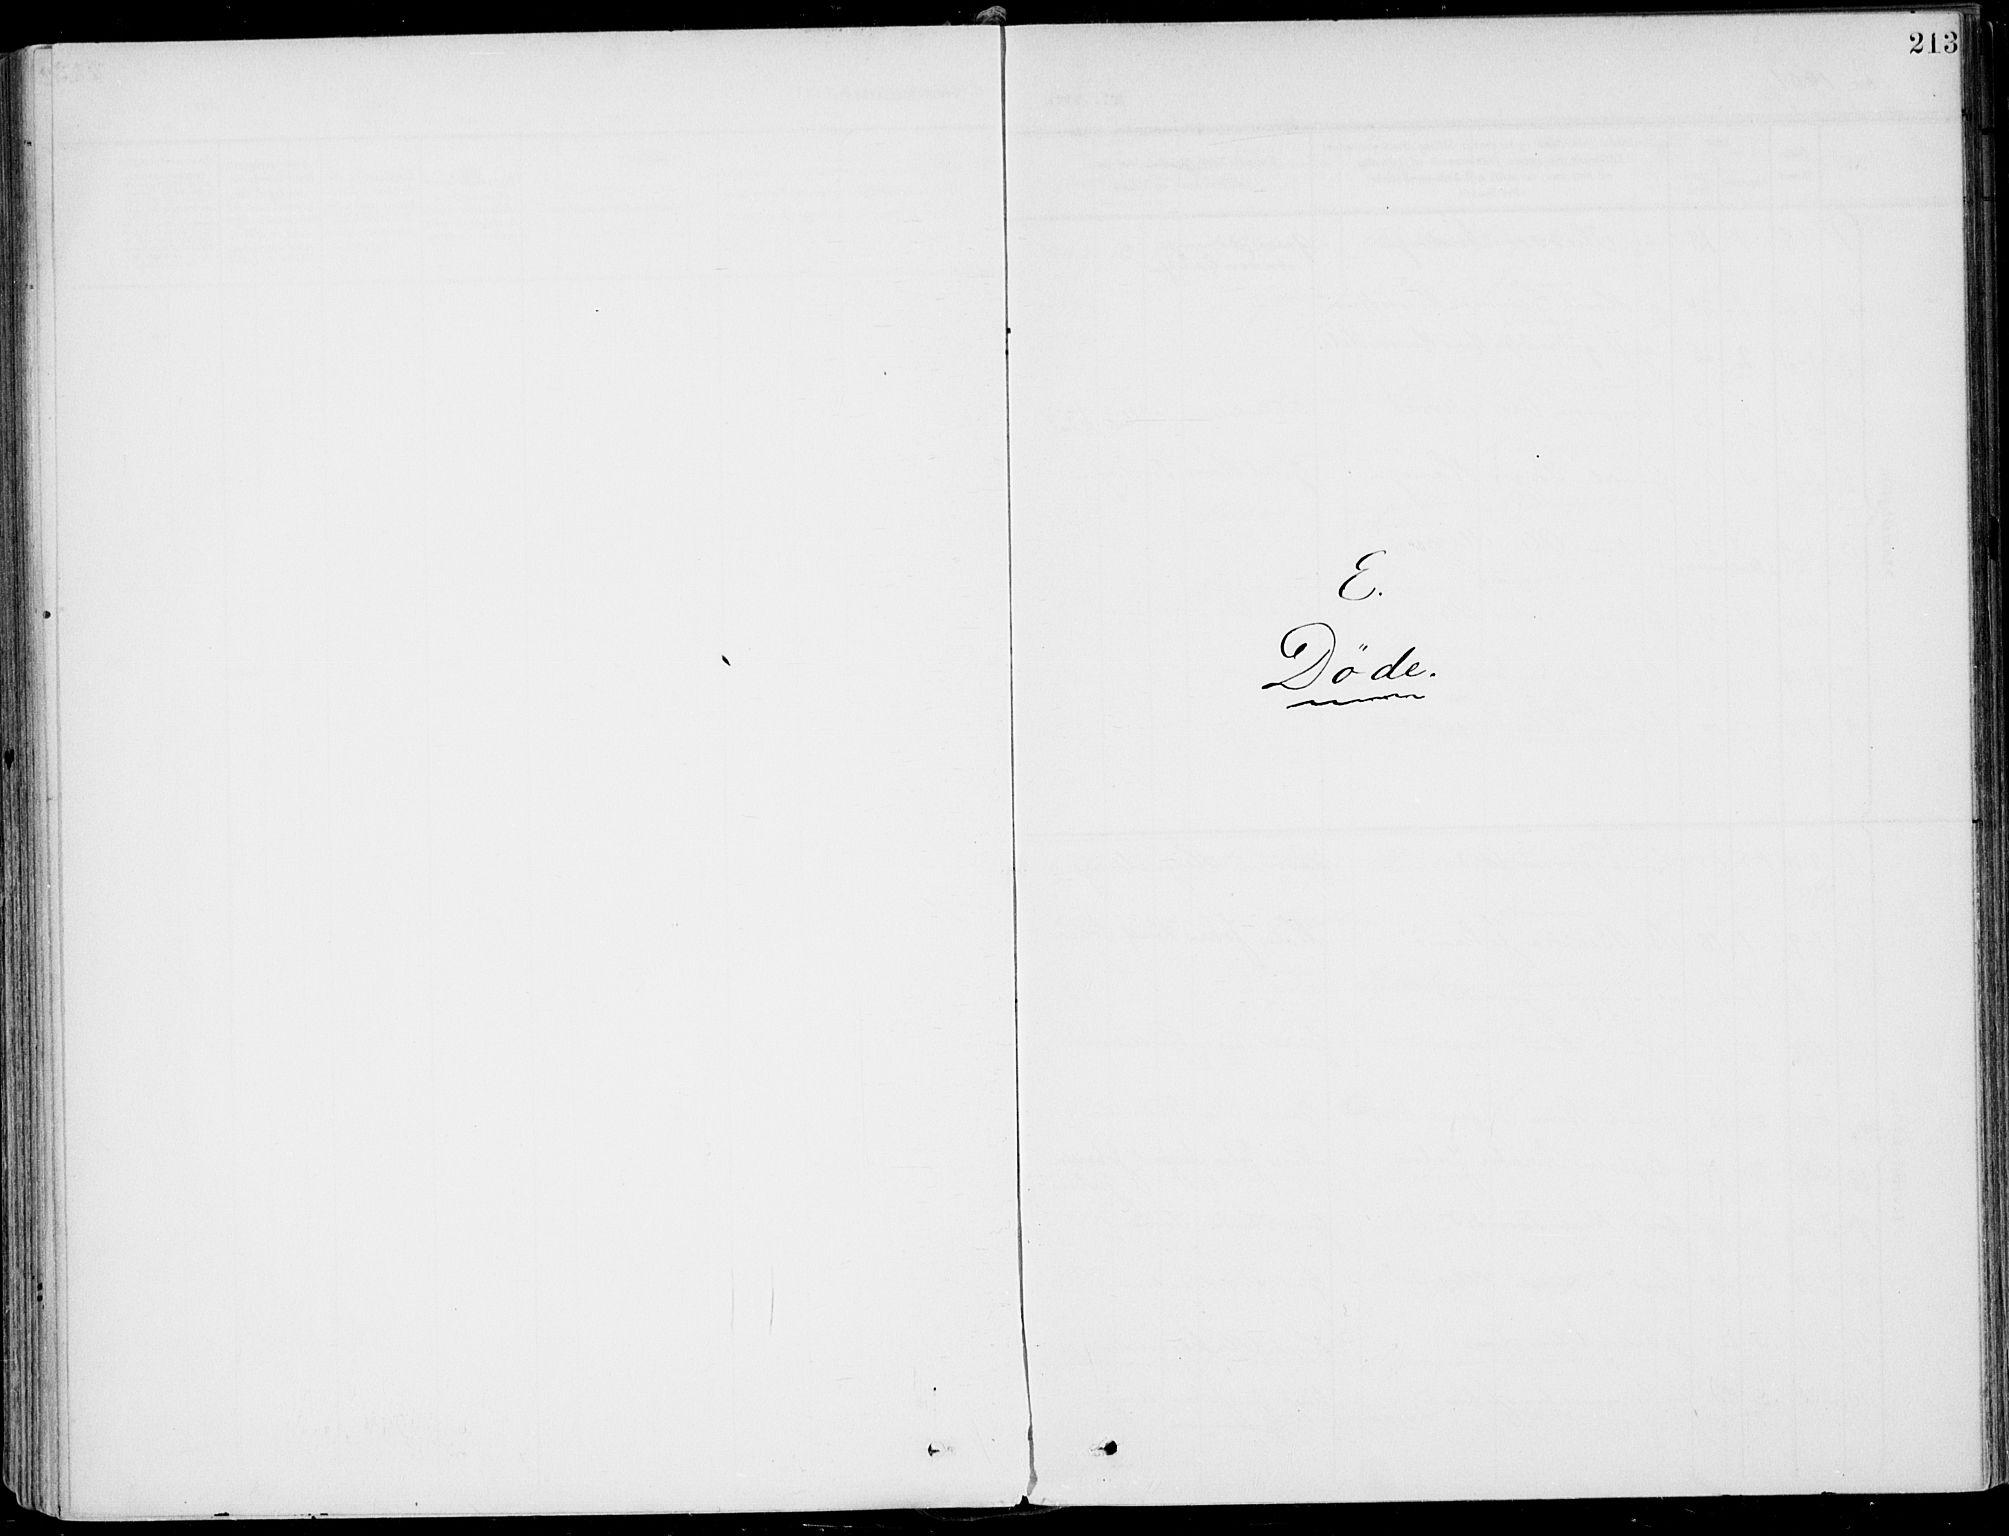 SAKO, Sigdal kirkebøker, F/Fb/L0002: Ministerialbok nr. II 2, 1901-1914, s. 213